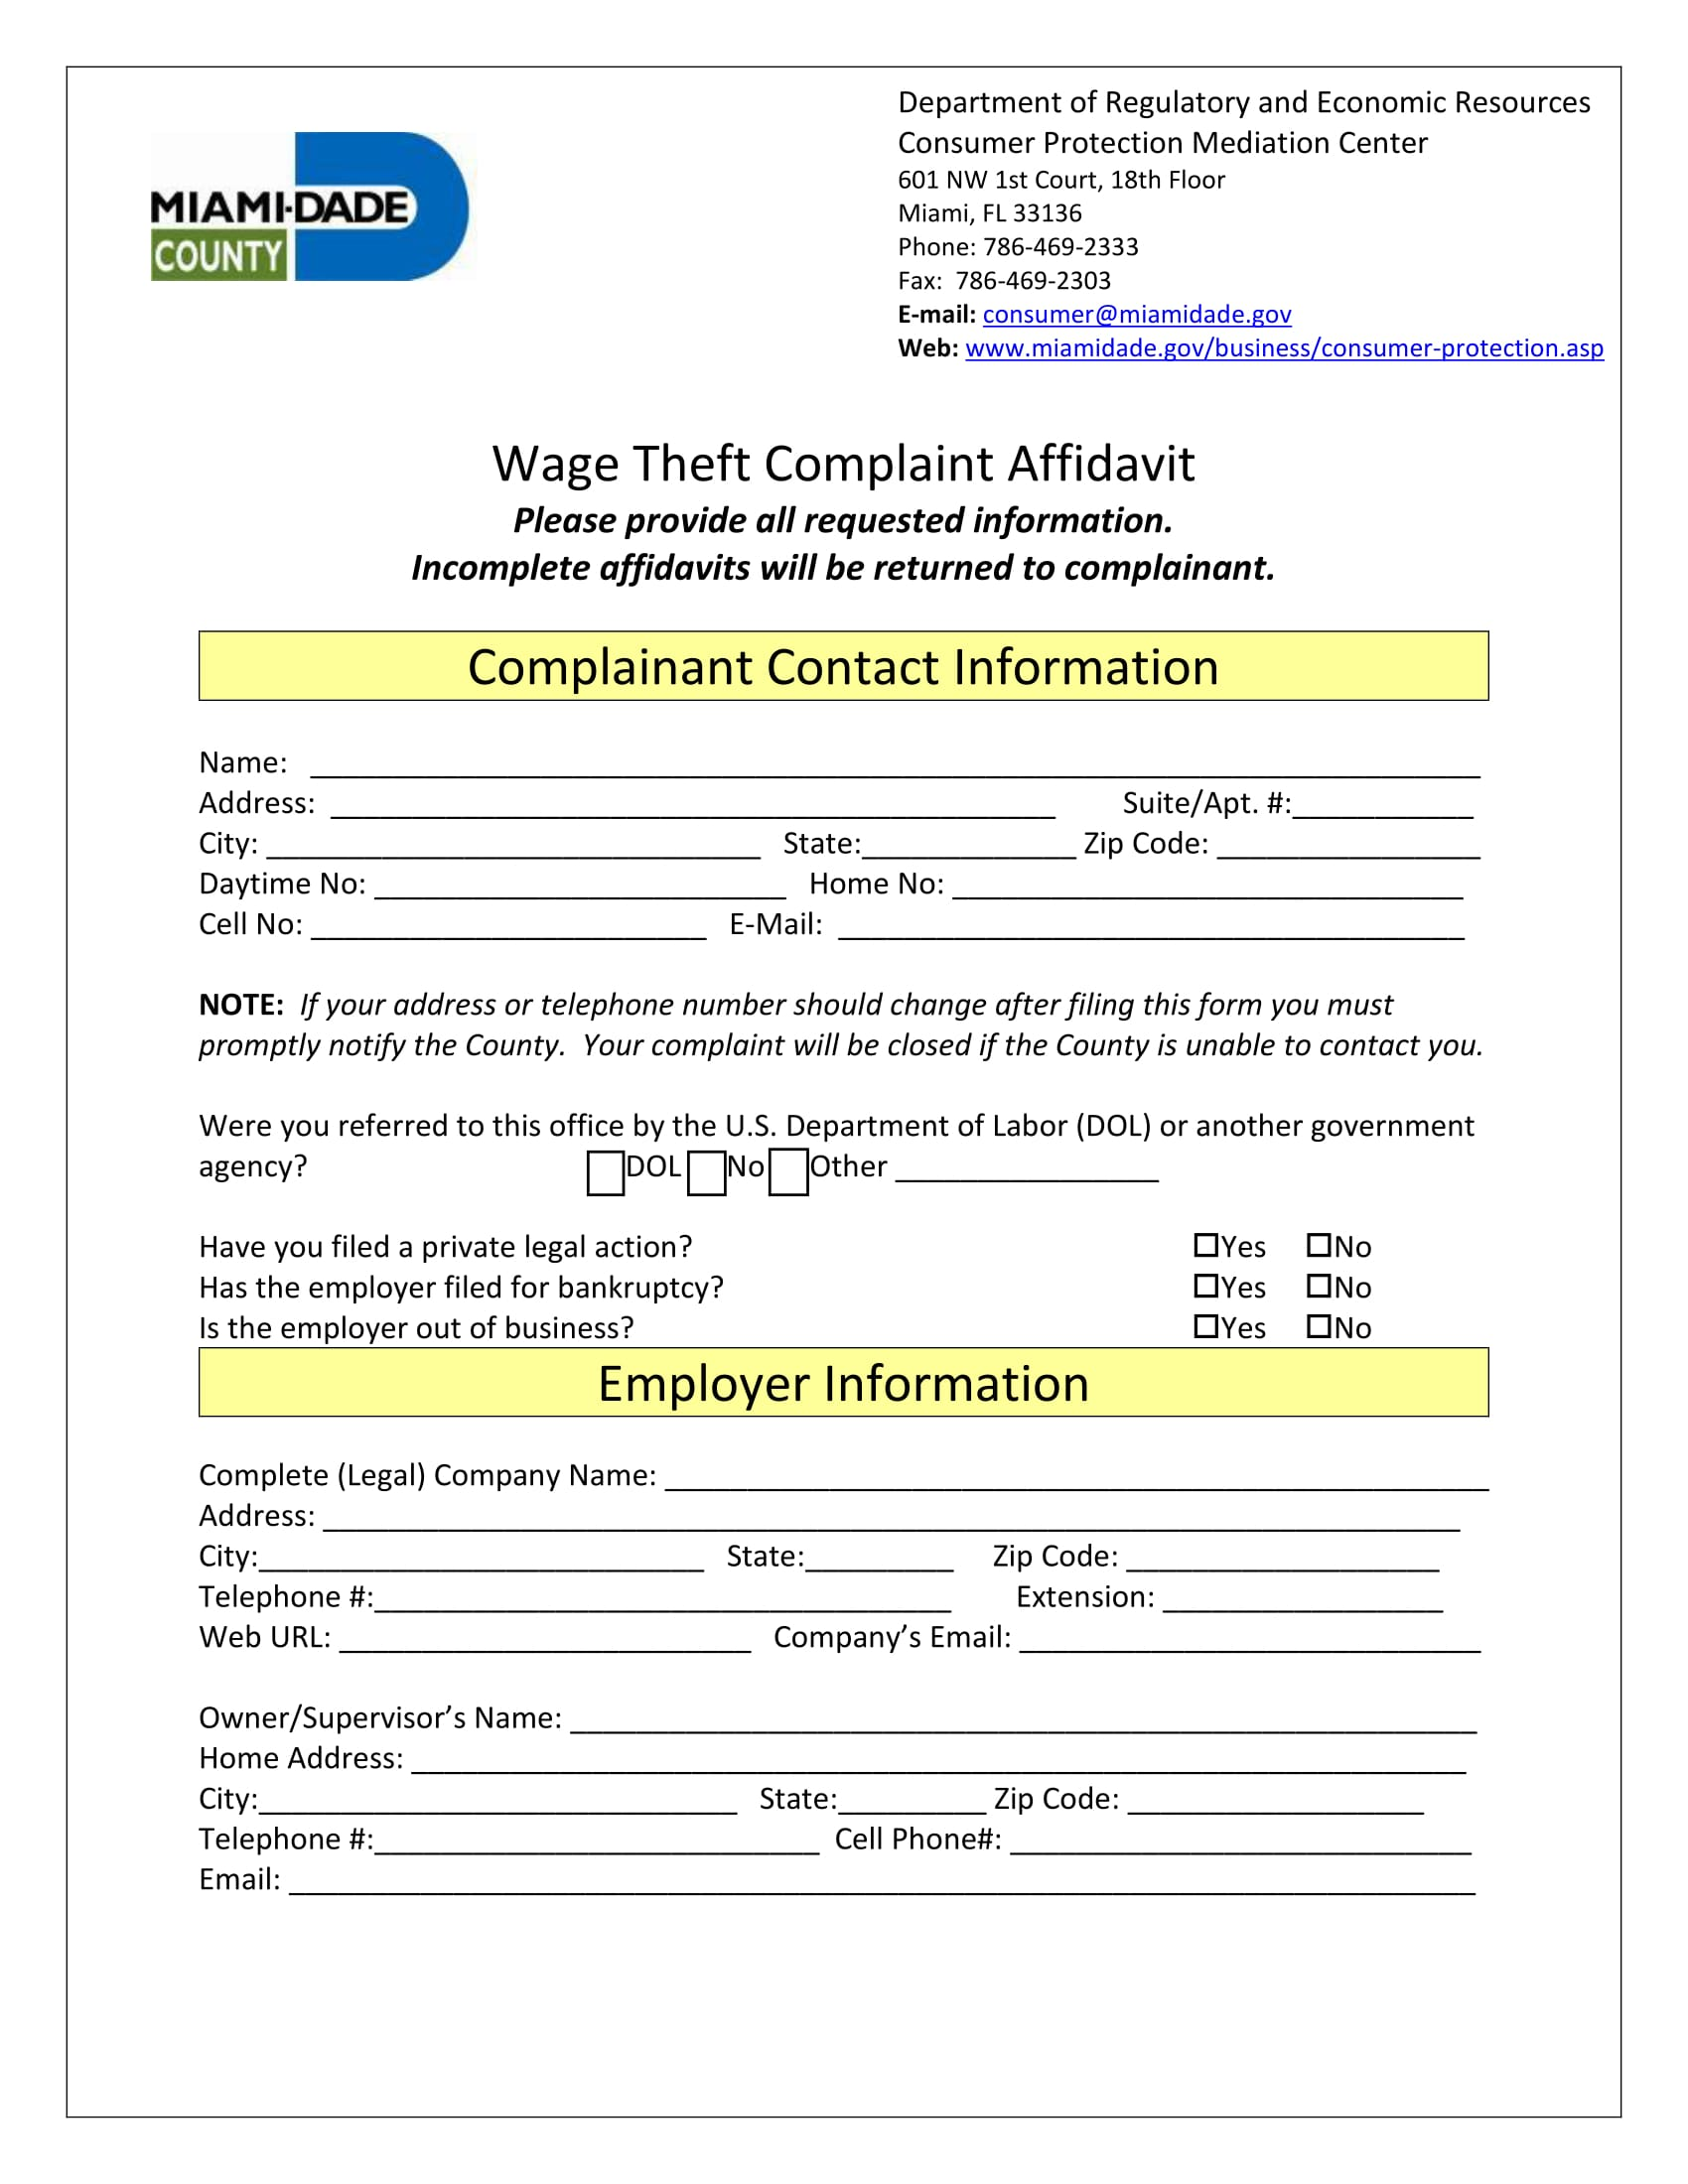 wage theft complaint affidavit form 1